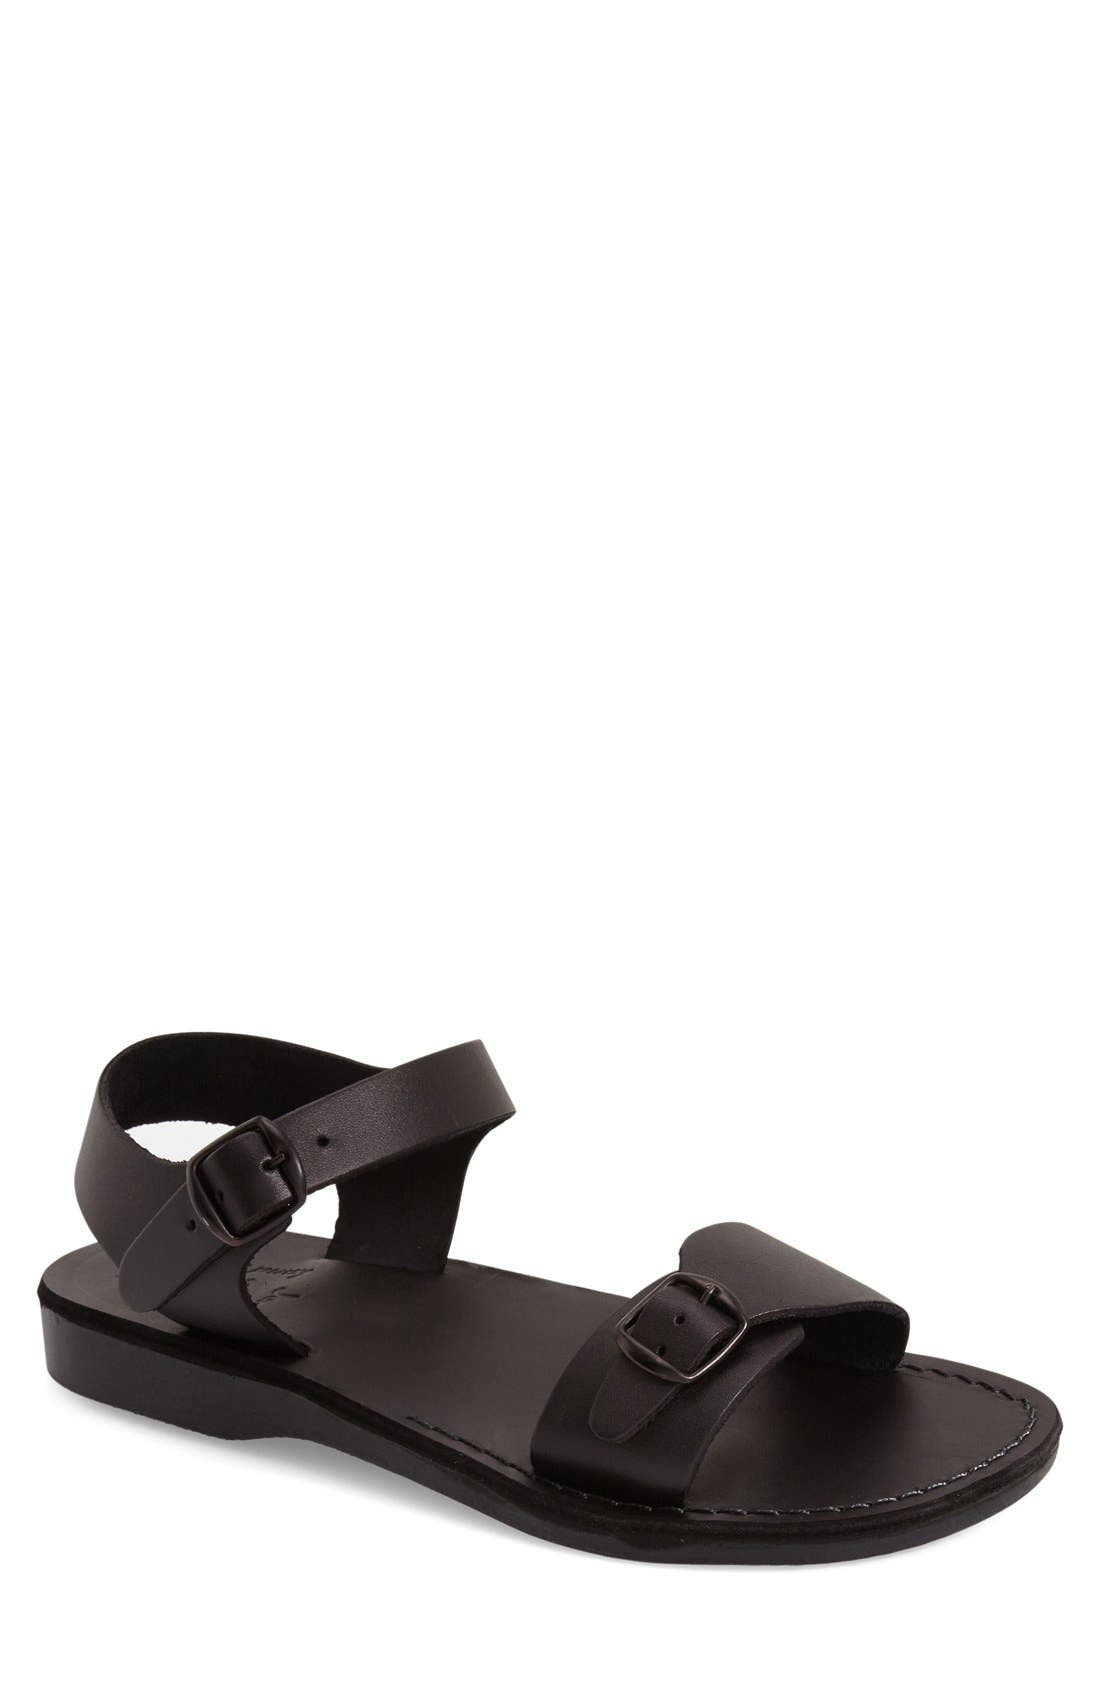 'The Original' Sandal,                         Main,                         color, BLACK LEATHER